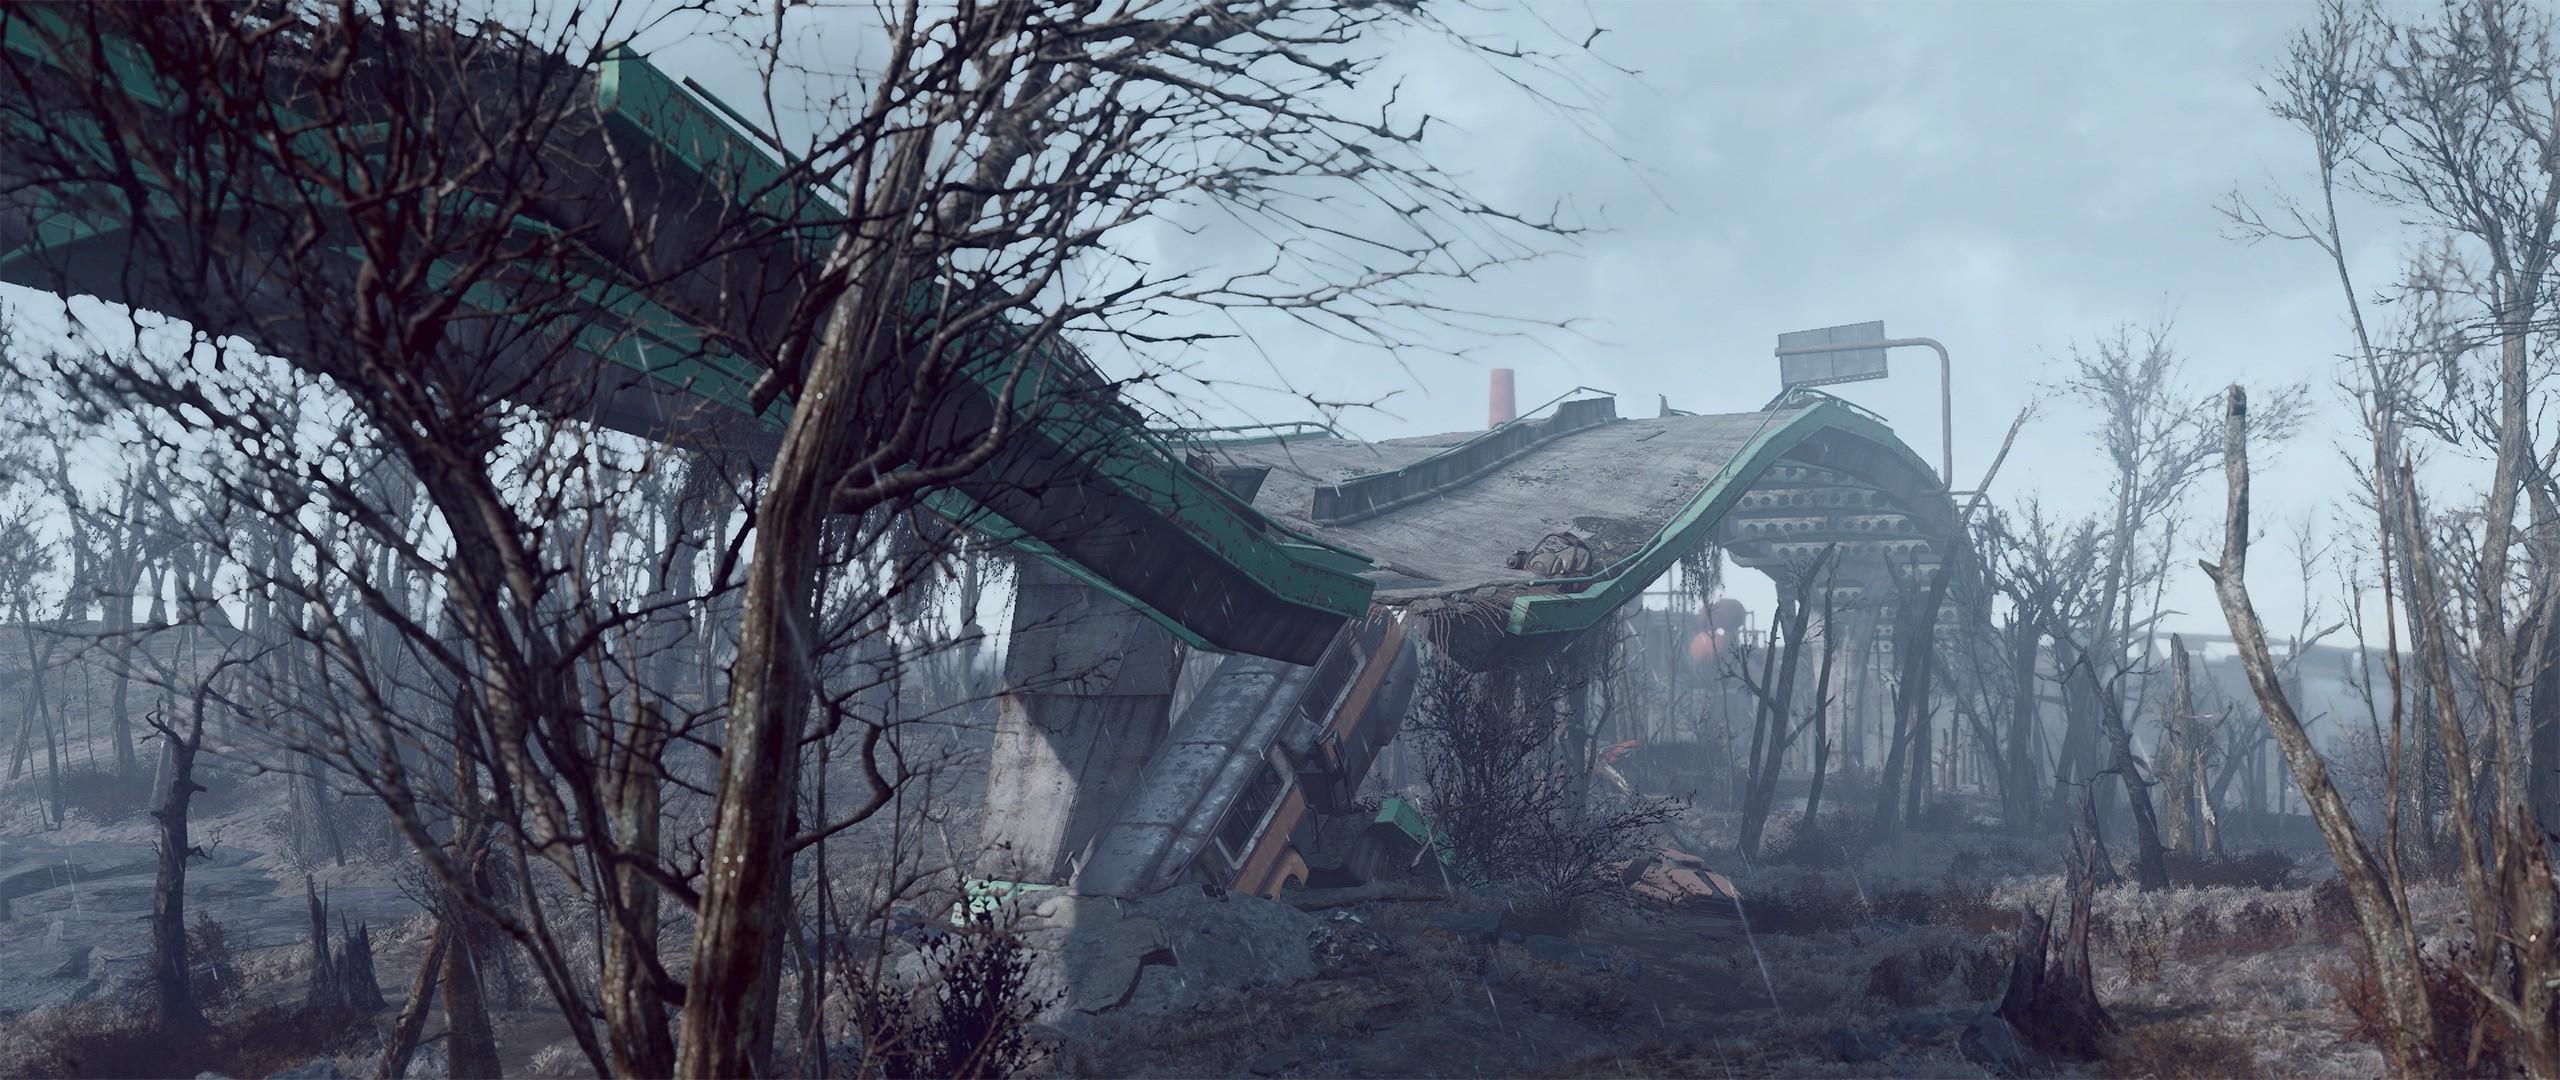 Wallpaper 2560x1080 Px Fallout 4 Video Games 2560x1080